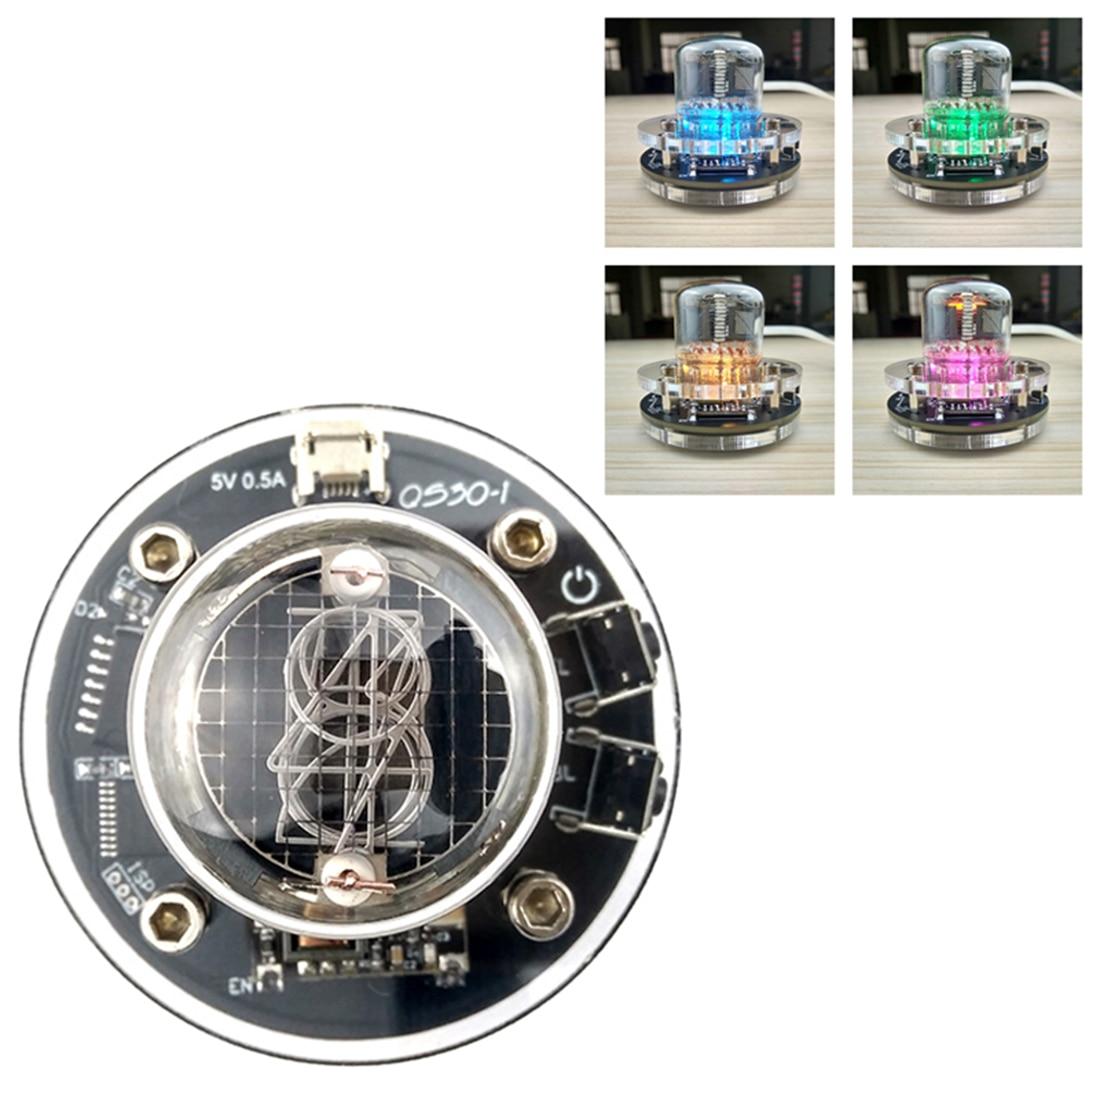 DIY Glow Tube Clock Base Multi-Colored LED Glow Tube Clock For Glow Tube QS30-1 SZ-8 SZ3-1 SZ1-1 ZM1020 (No Glow Tube ) For Kids